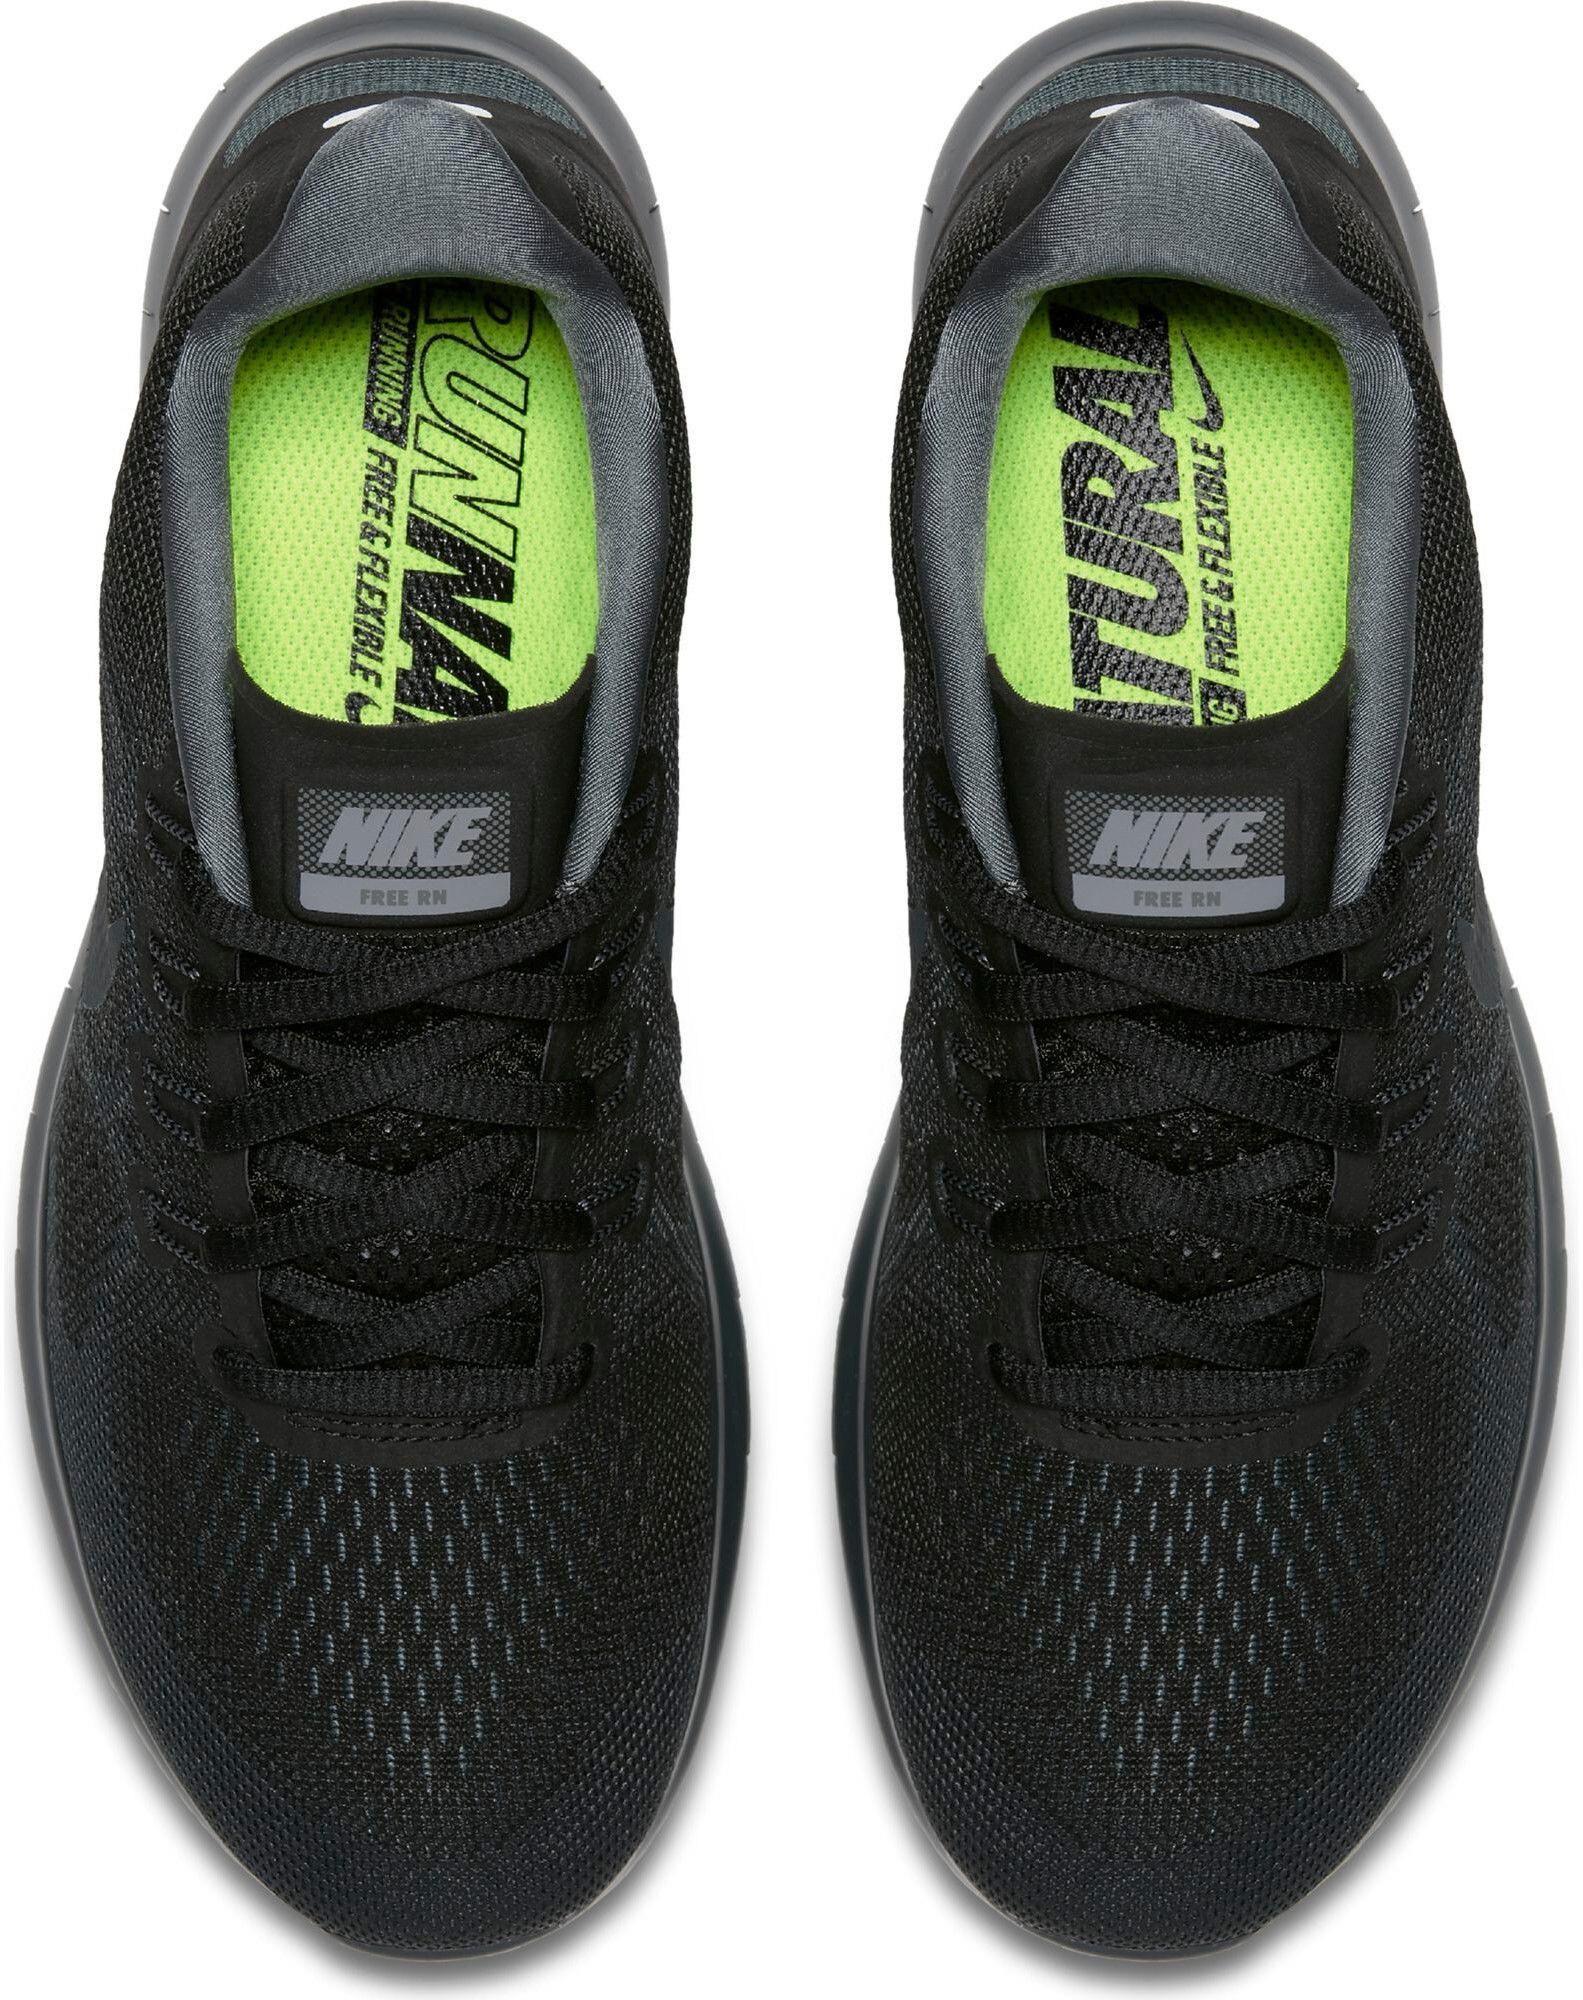 34d3e17e78a617 Nike Free RN 2017 Running Shoes Women black anthracite-dark grey-cool grey